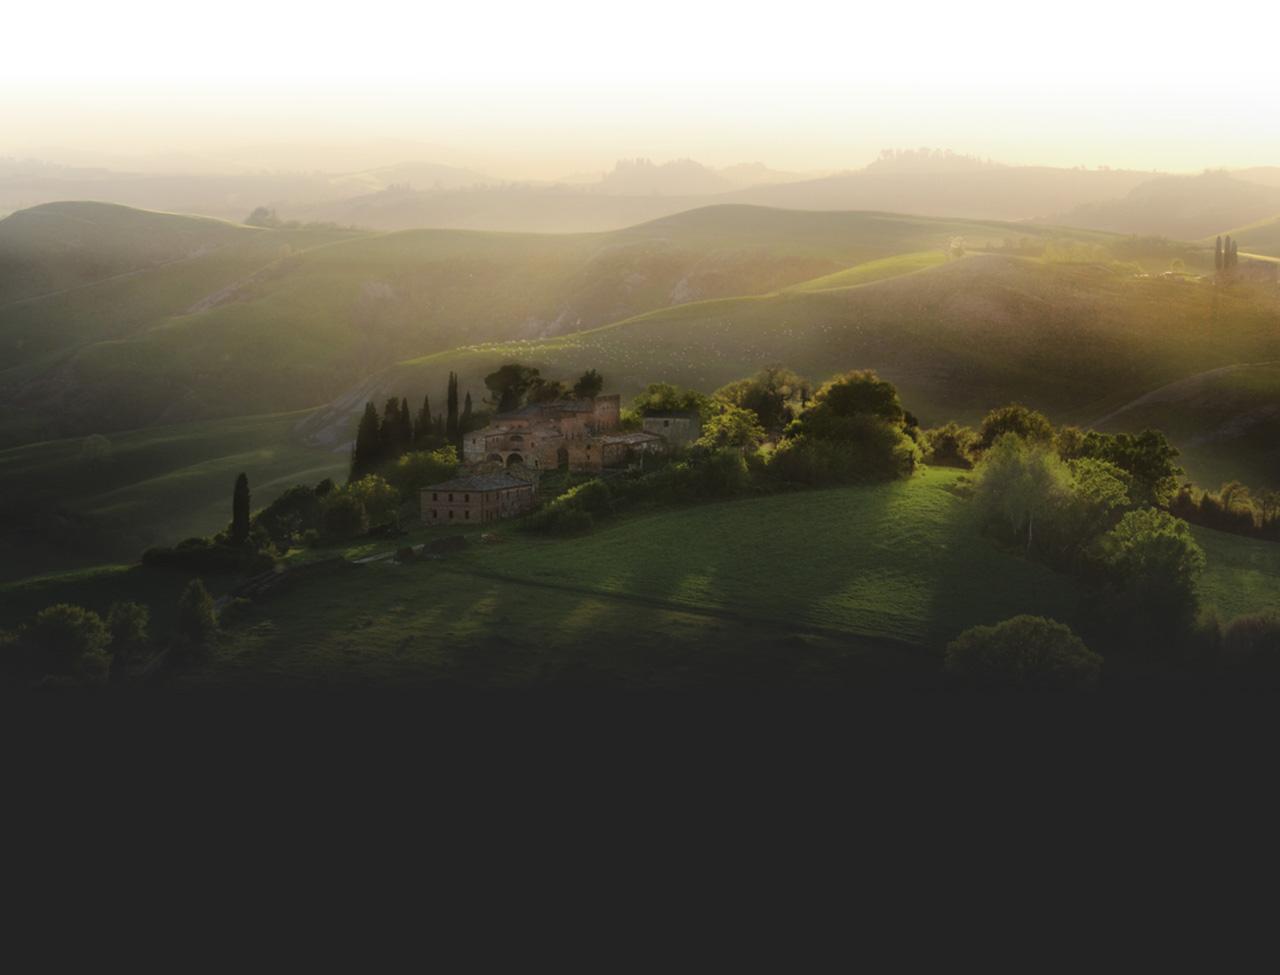 Image of an Italian hillside